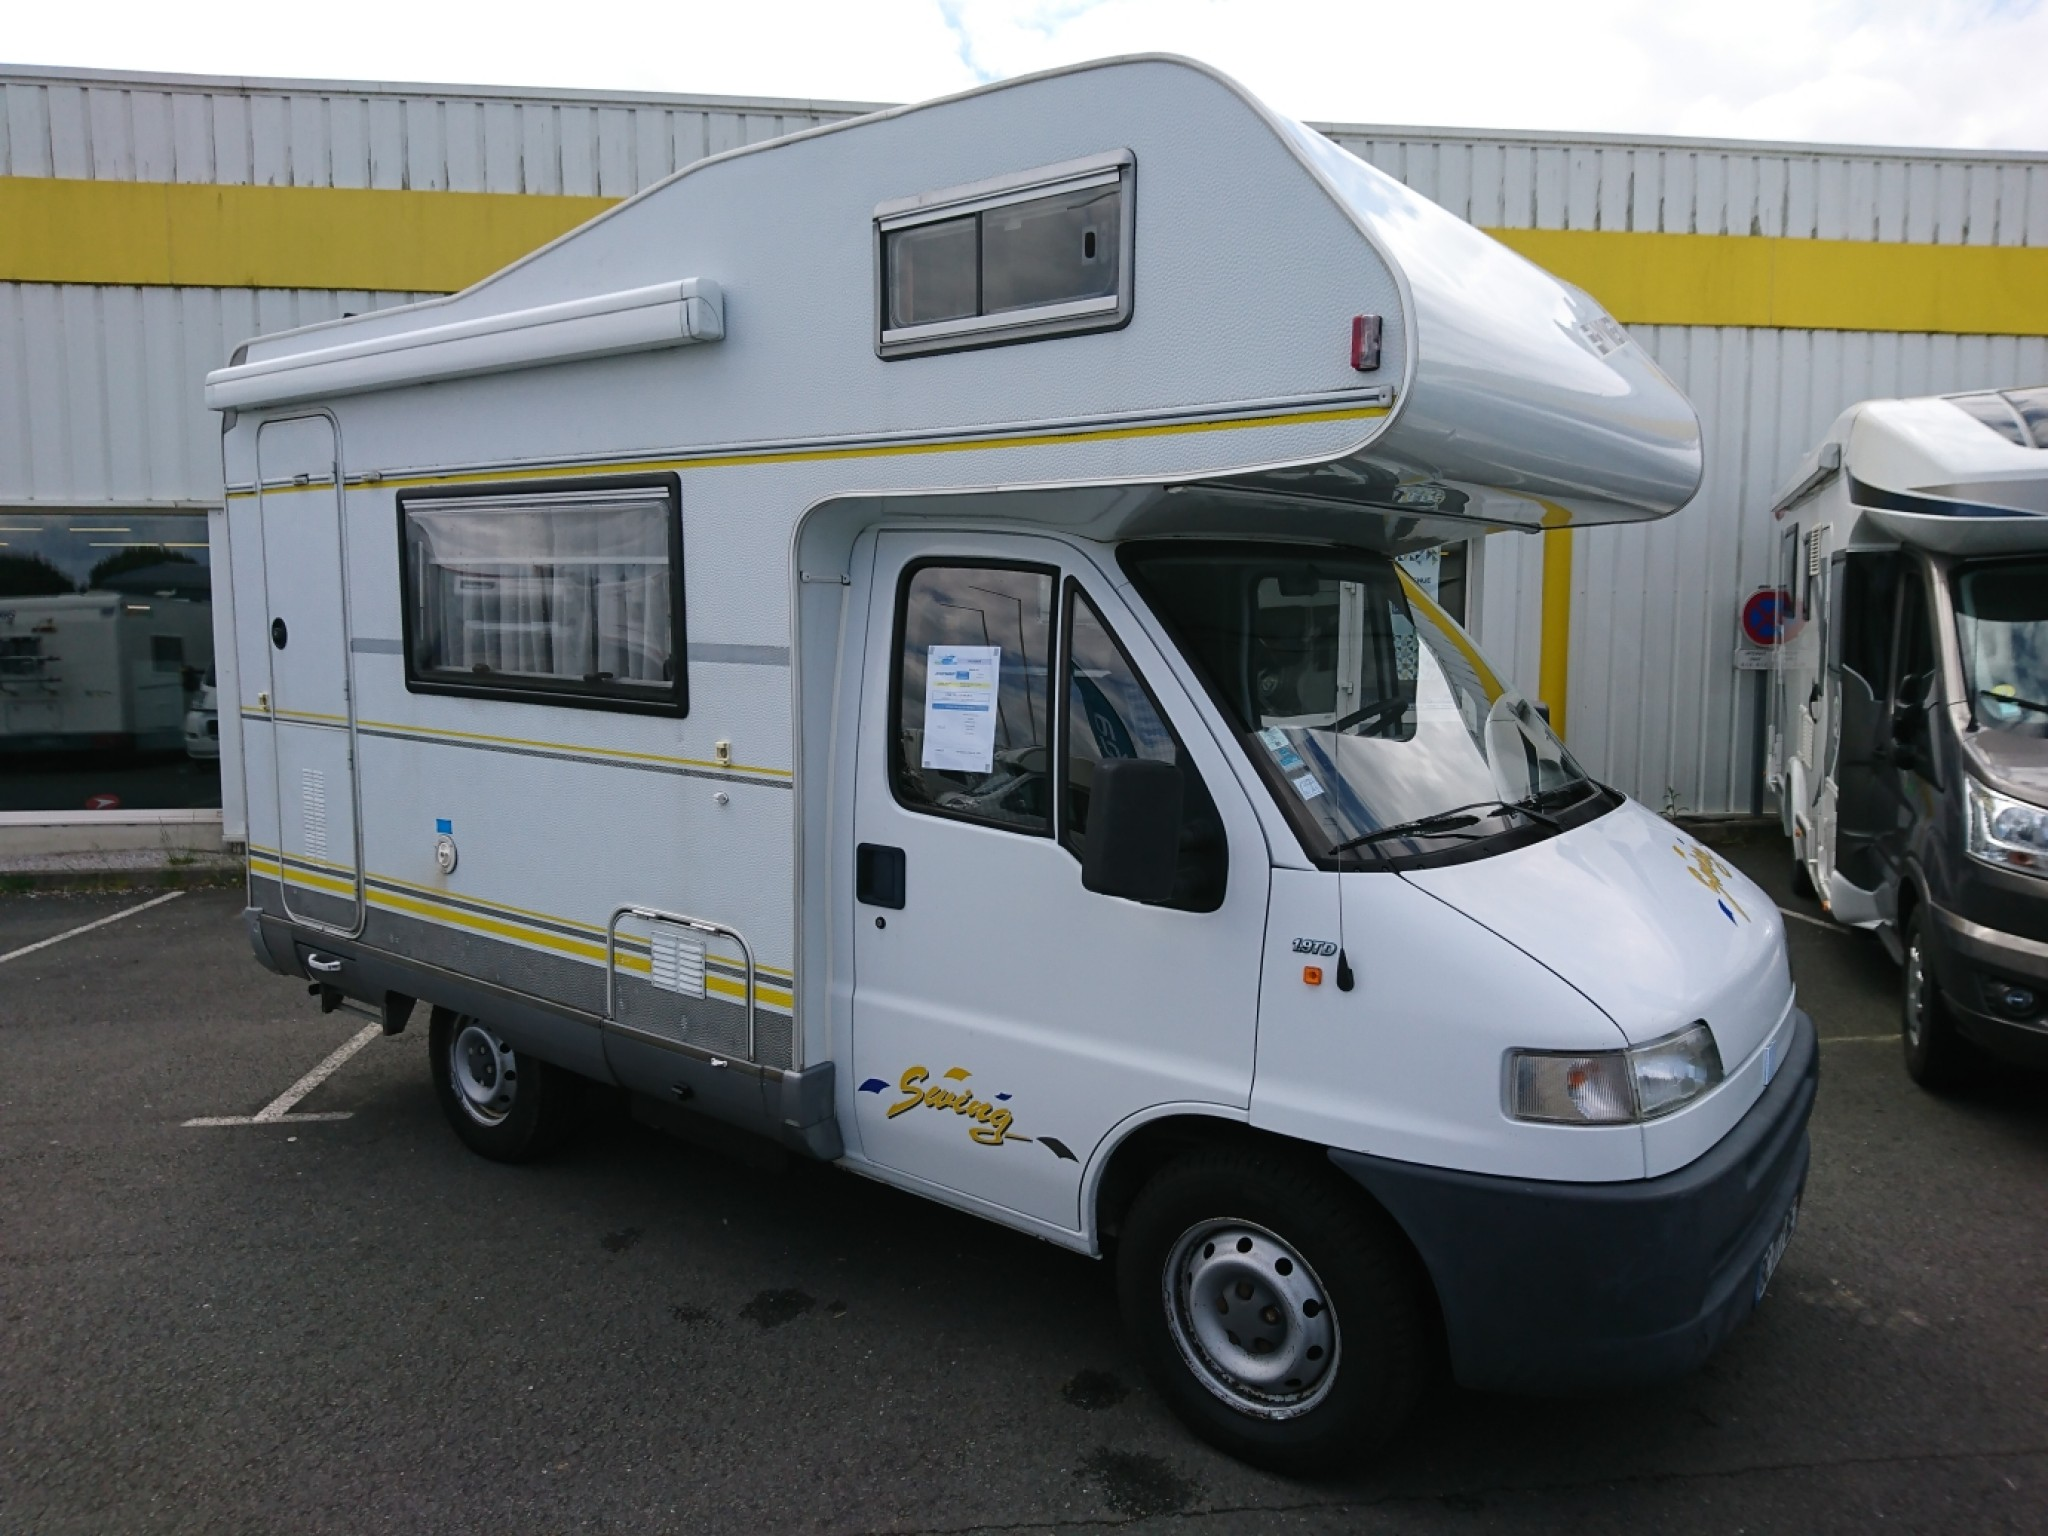 Hymer Swing 494 occasion de 1999 - Fiat - Camping car en